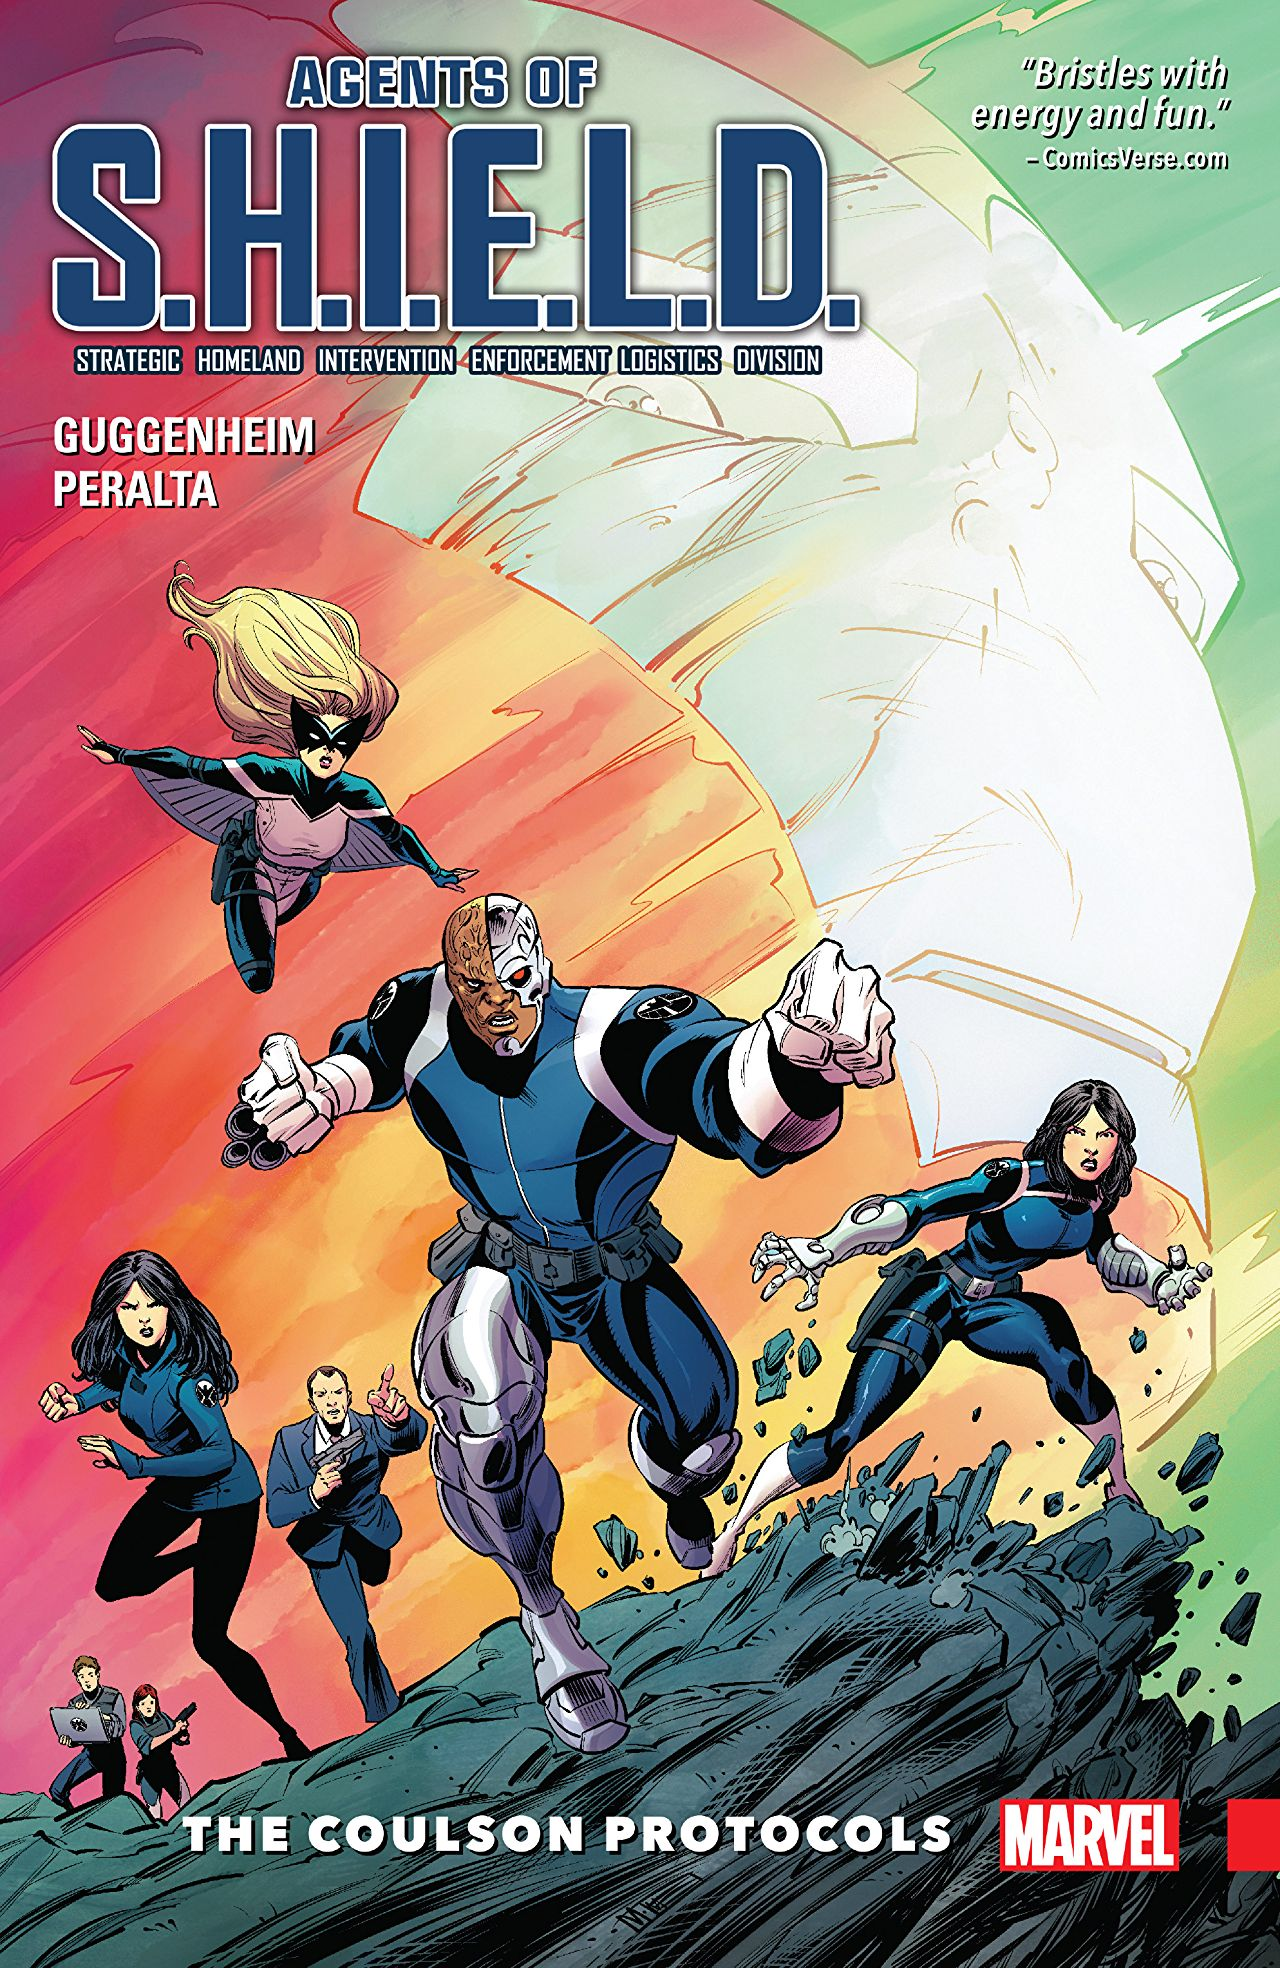 Agents of S.H.I.E.L.D. TPB Vol 1 1: The Coulson Protocols